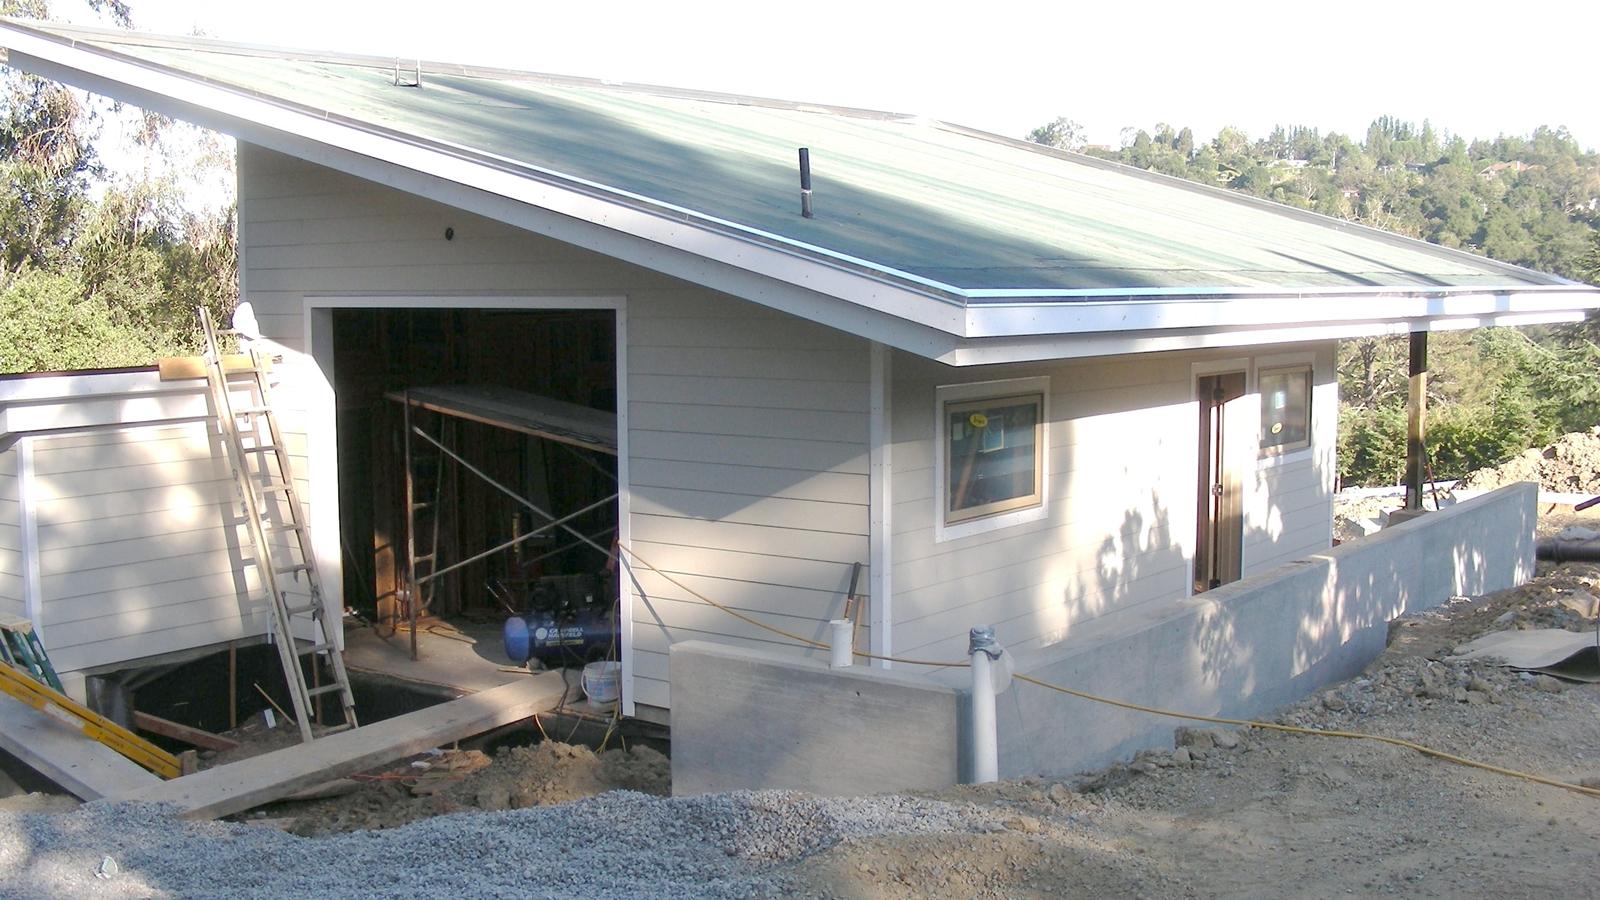 8. Aug 28, 2008: Preparing the driveway